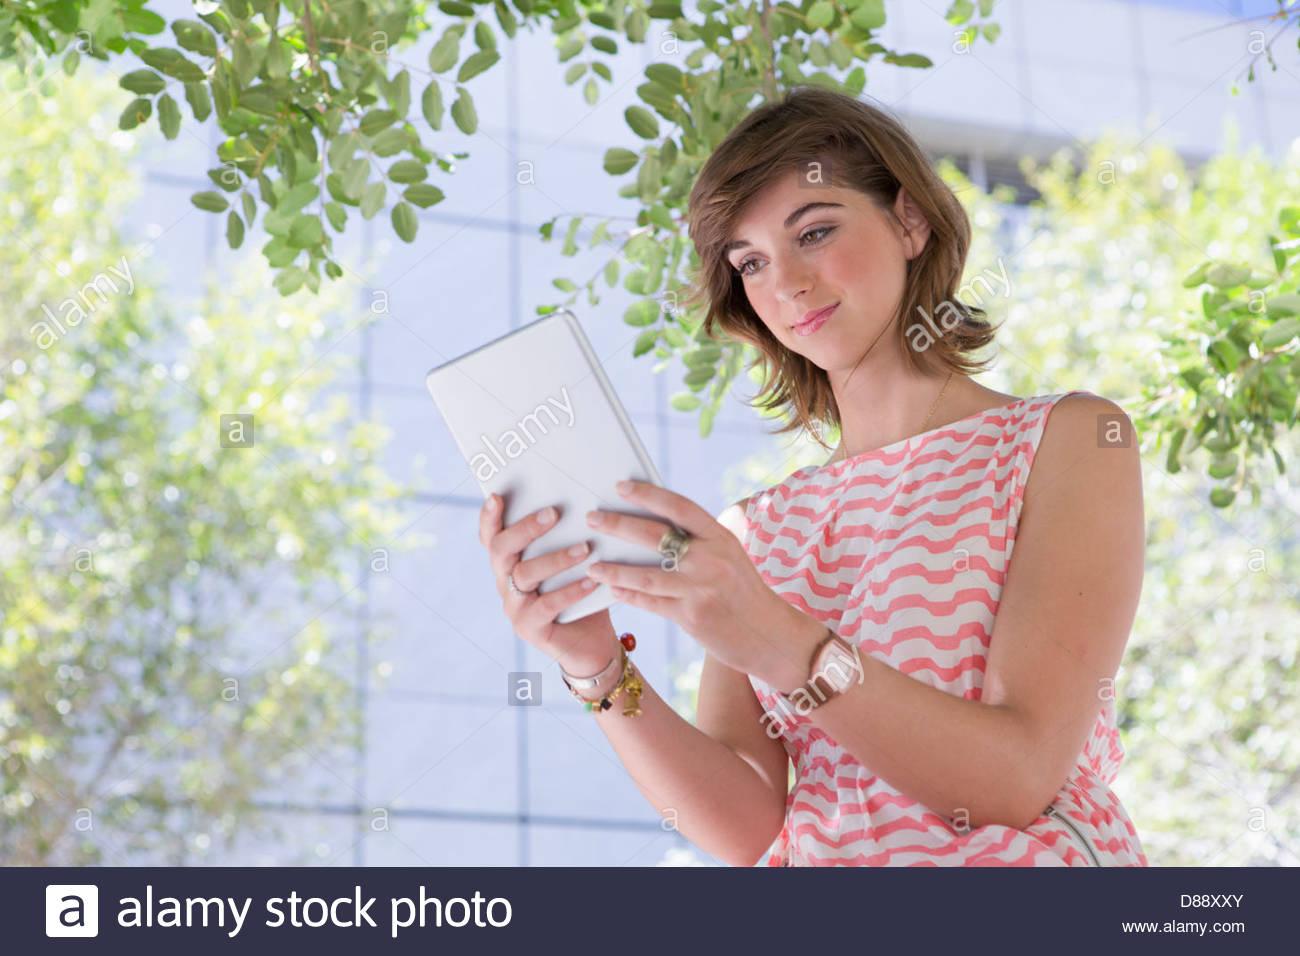 Lächelnde junge Frau mit digital-Tablette unter Baum Stockbild